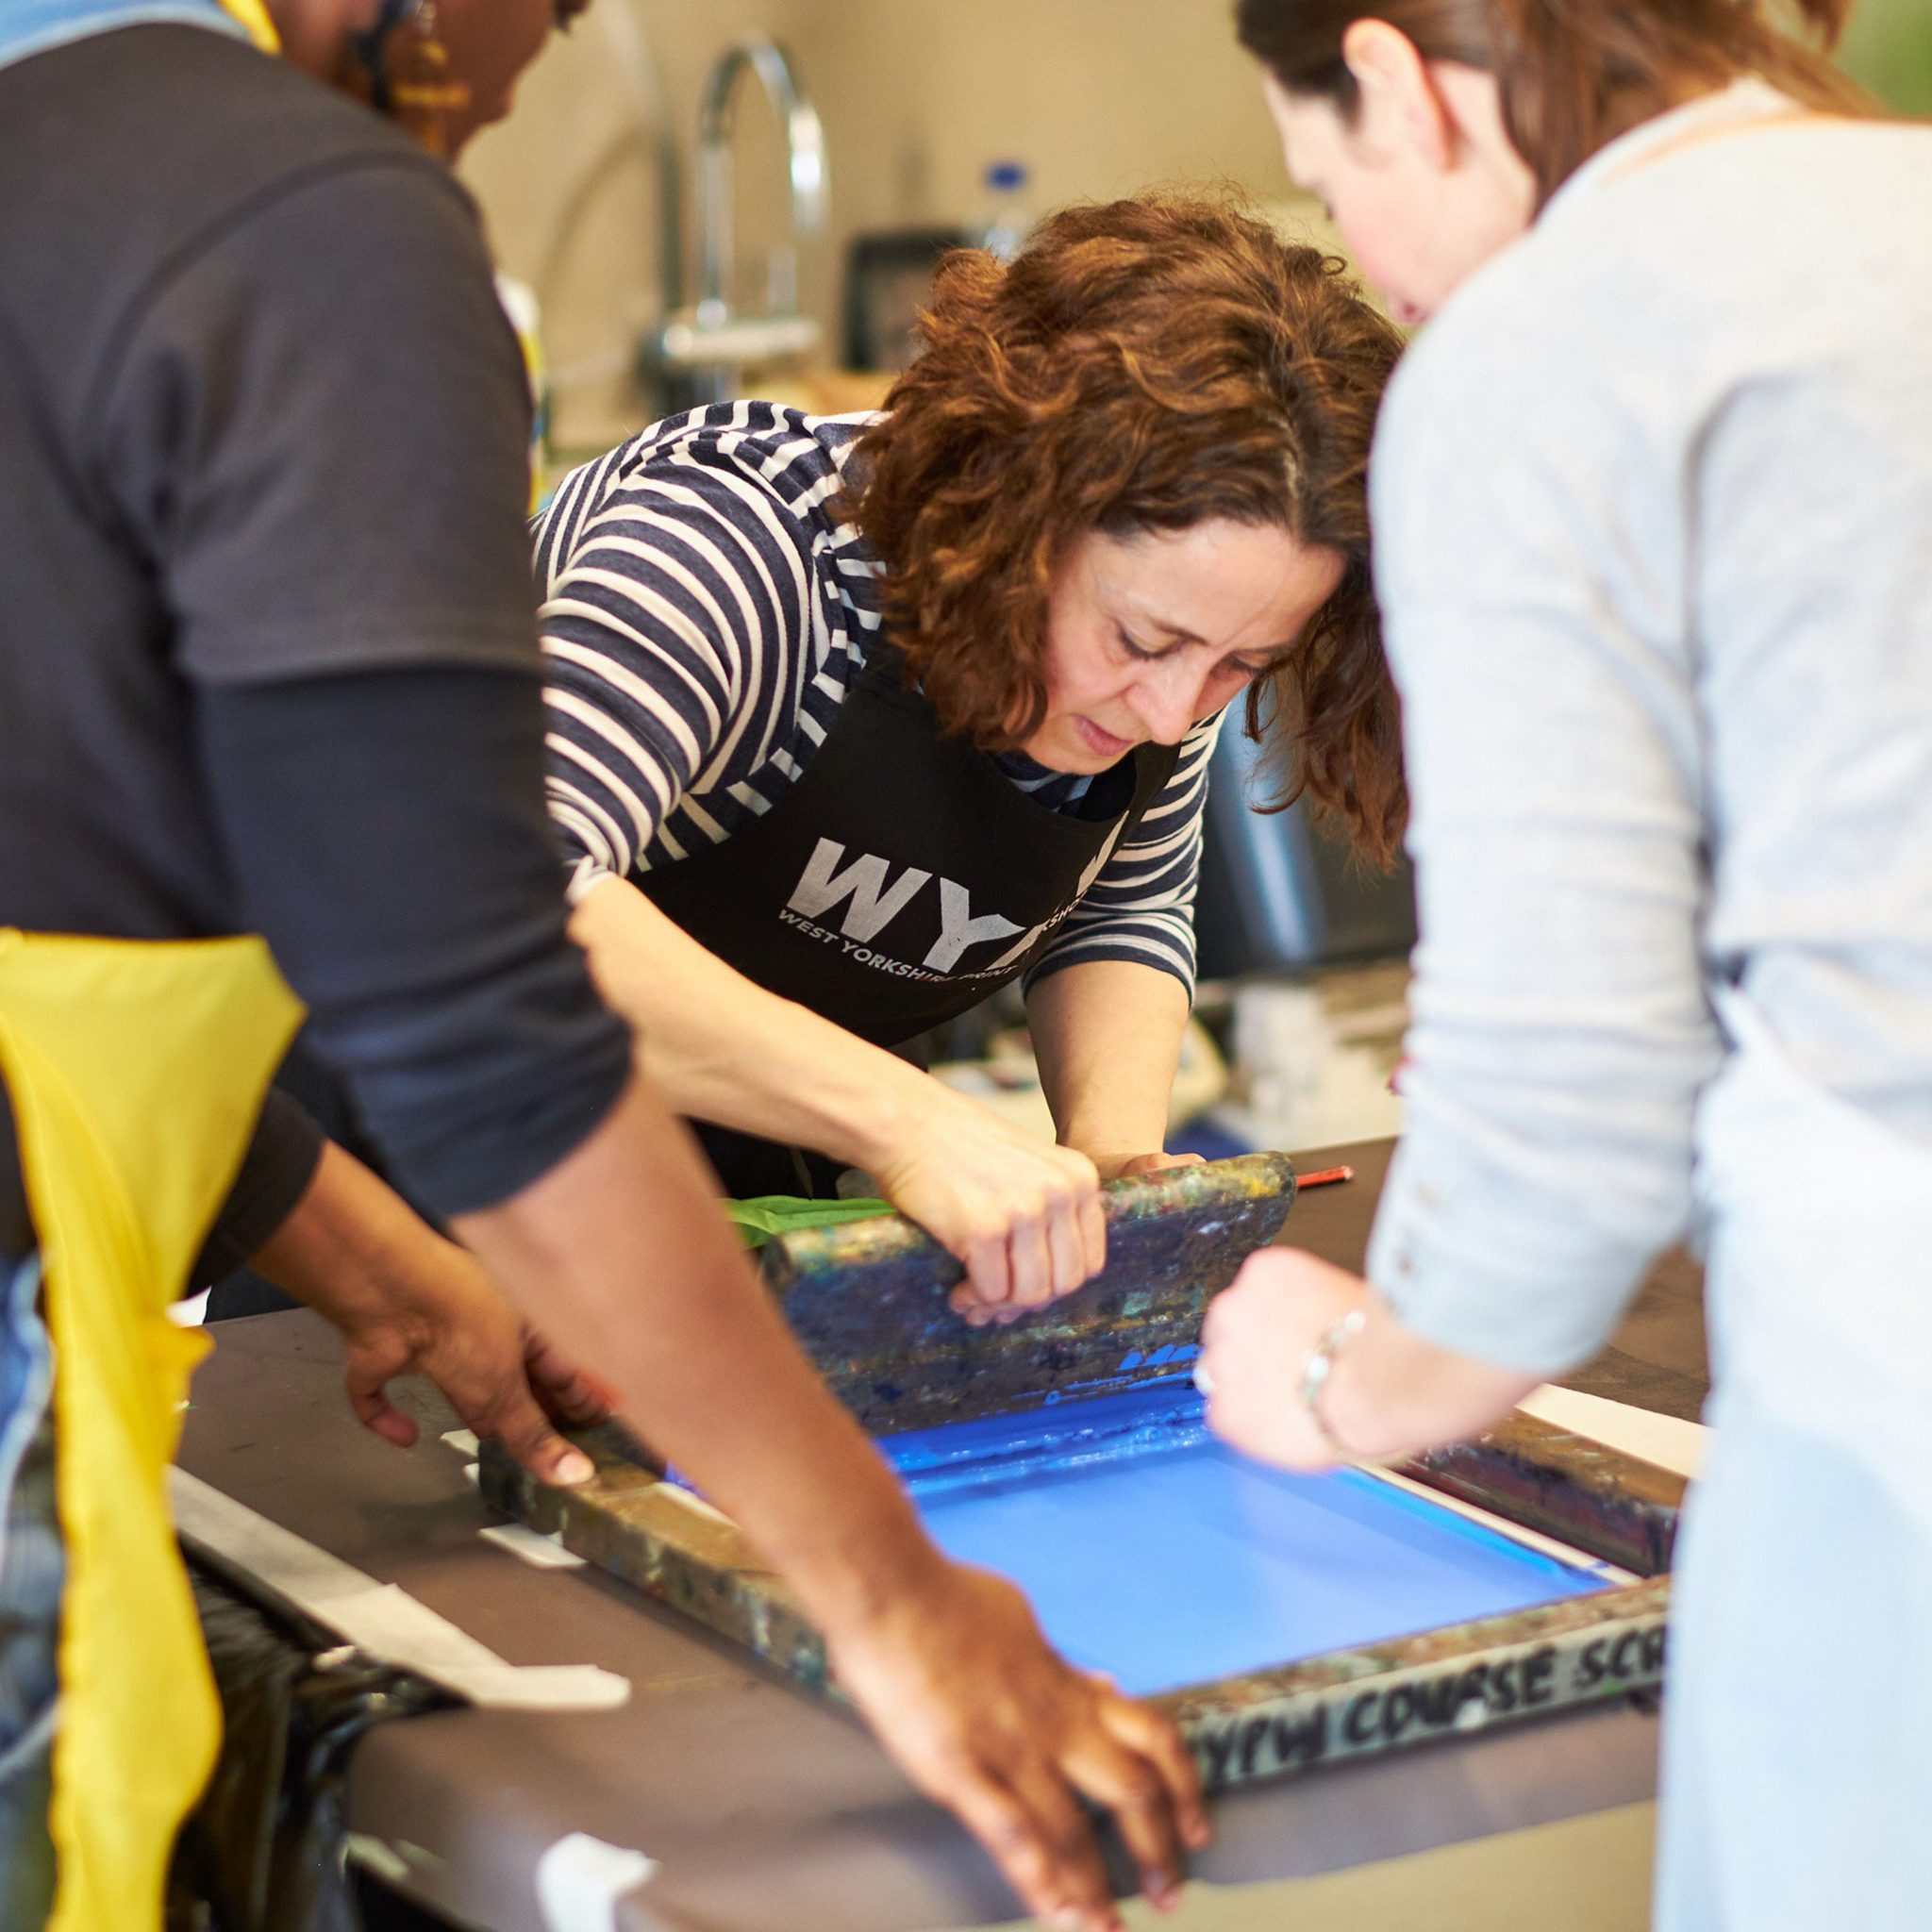 Karen Stansfield teaching screen printing